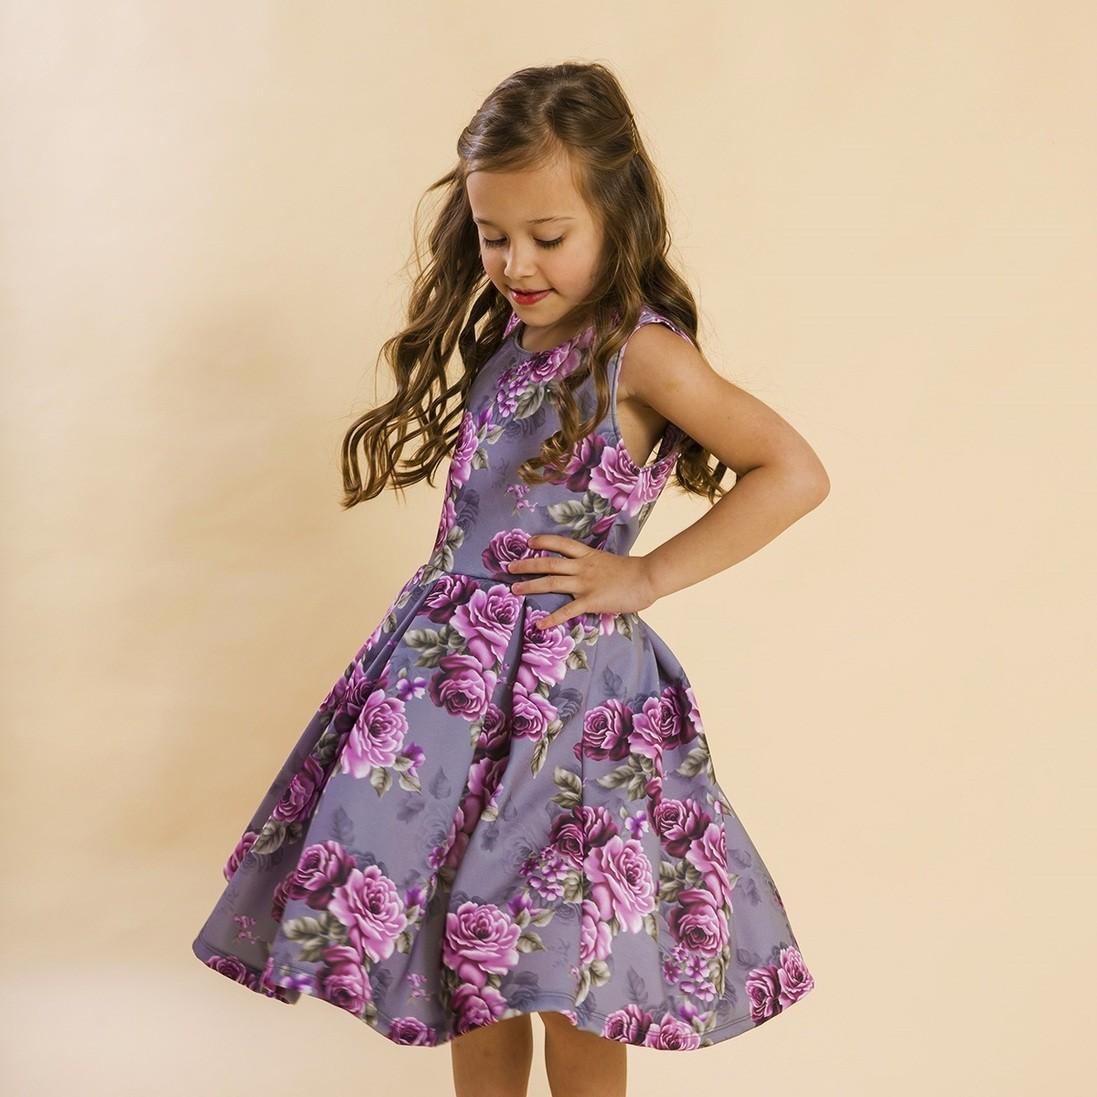 Vestido Infantil Malha Rosas Cinza